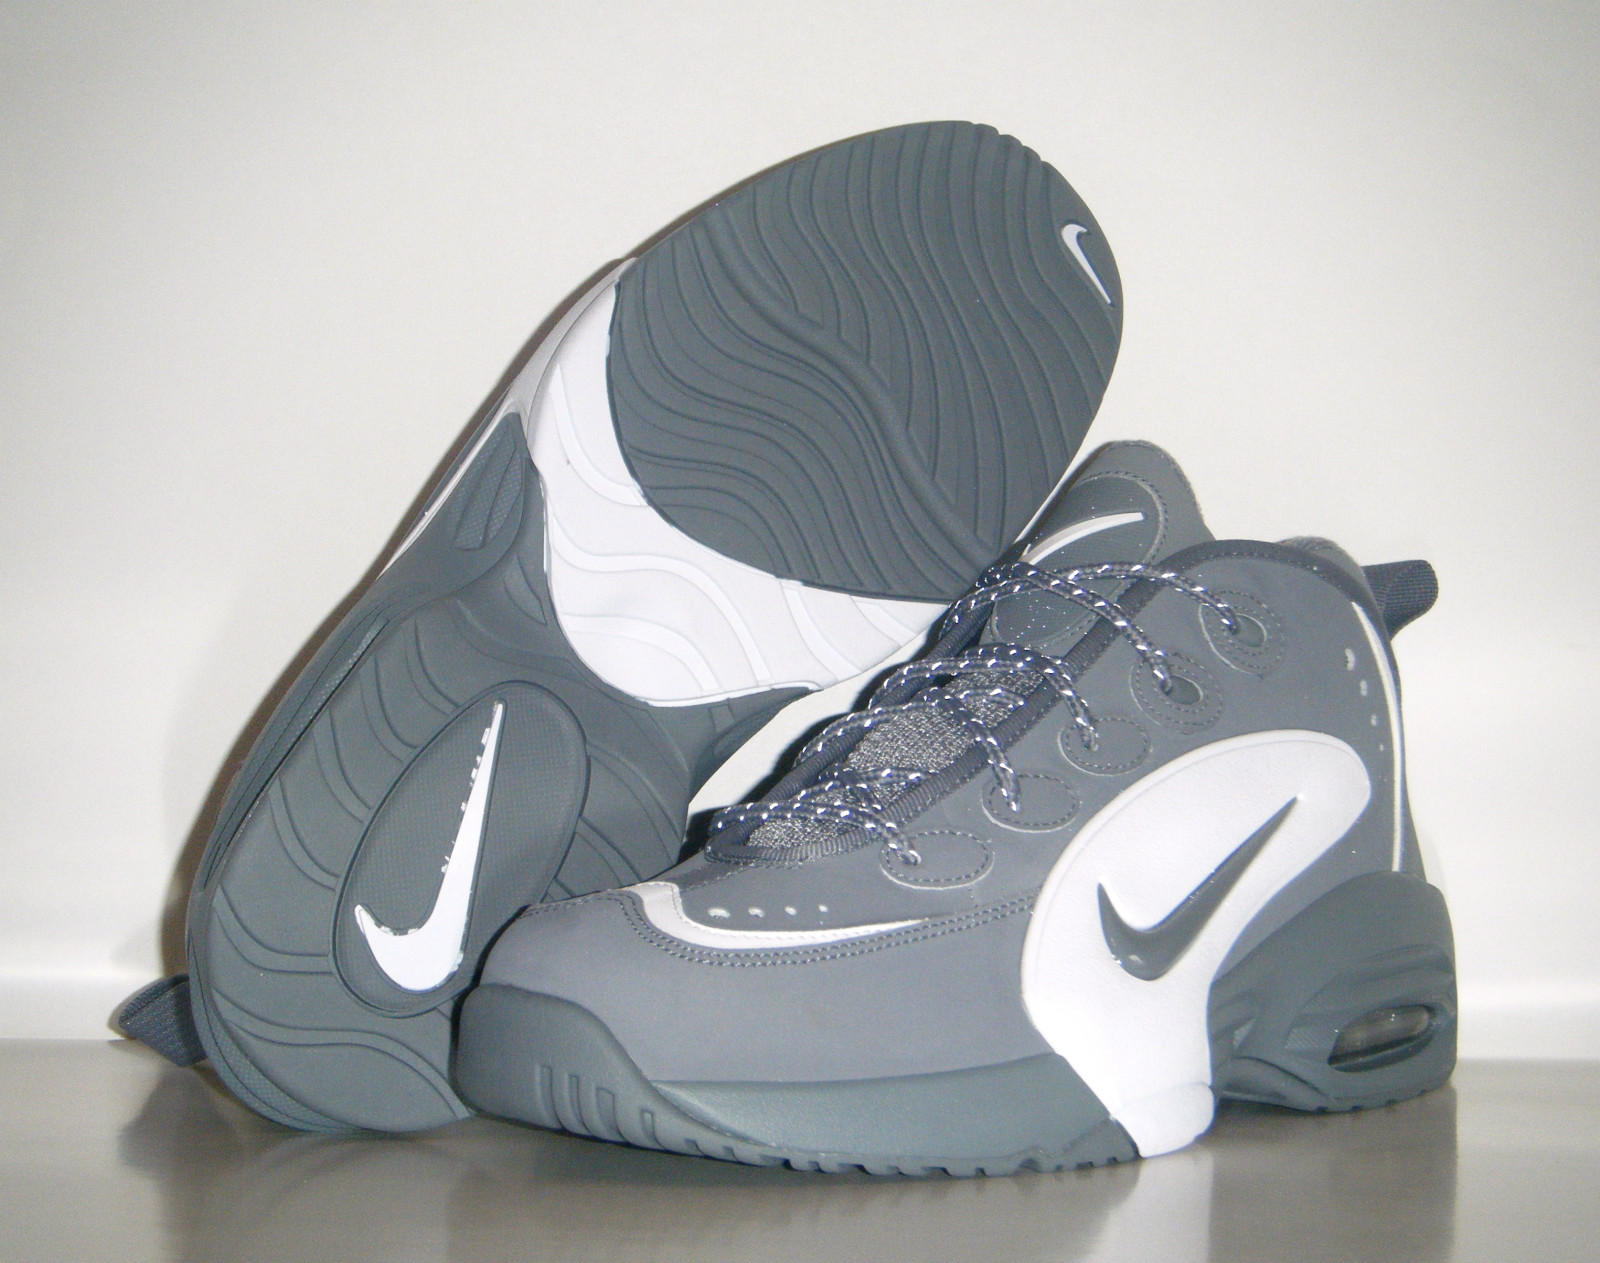 30%OFF Nike Air Way Up Cool Grey 2013 Retro